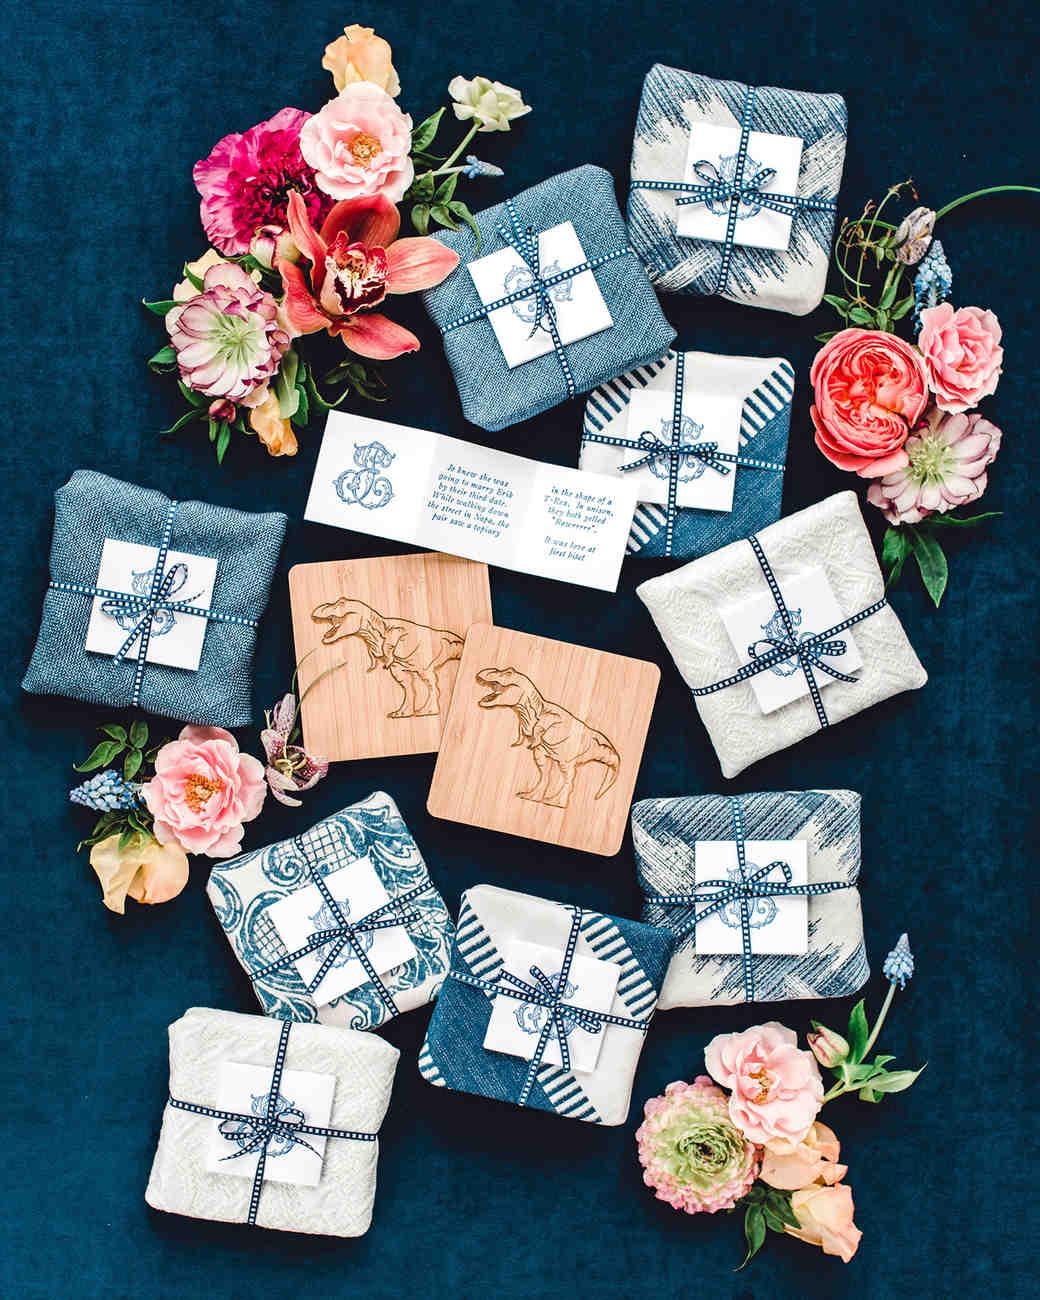 johanna erik wedding favors